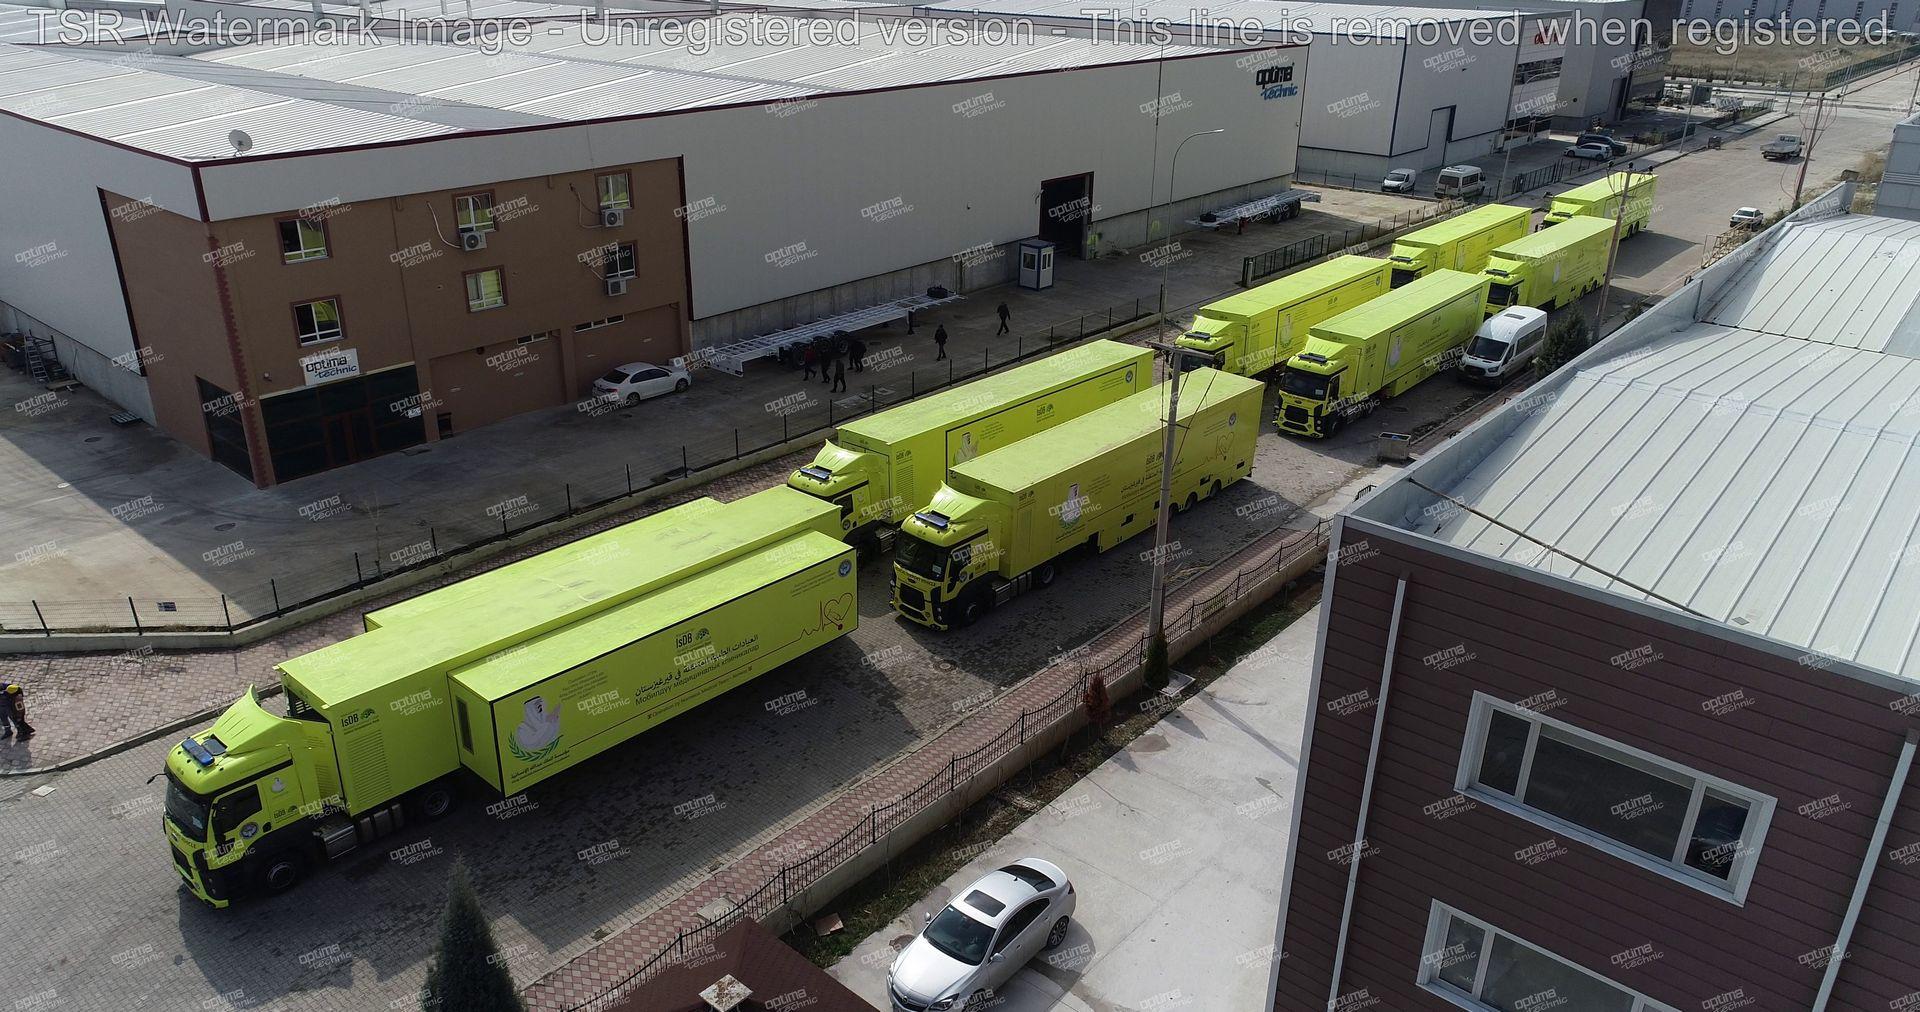 Trailer Based Field Hospitals